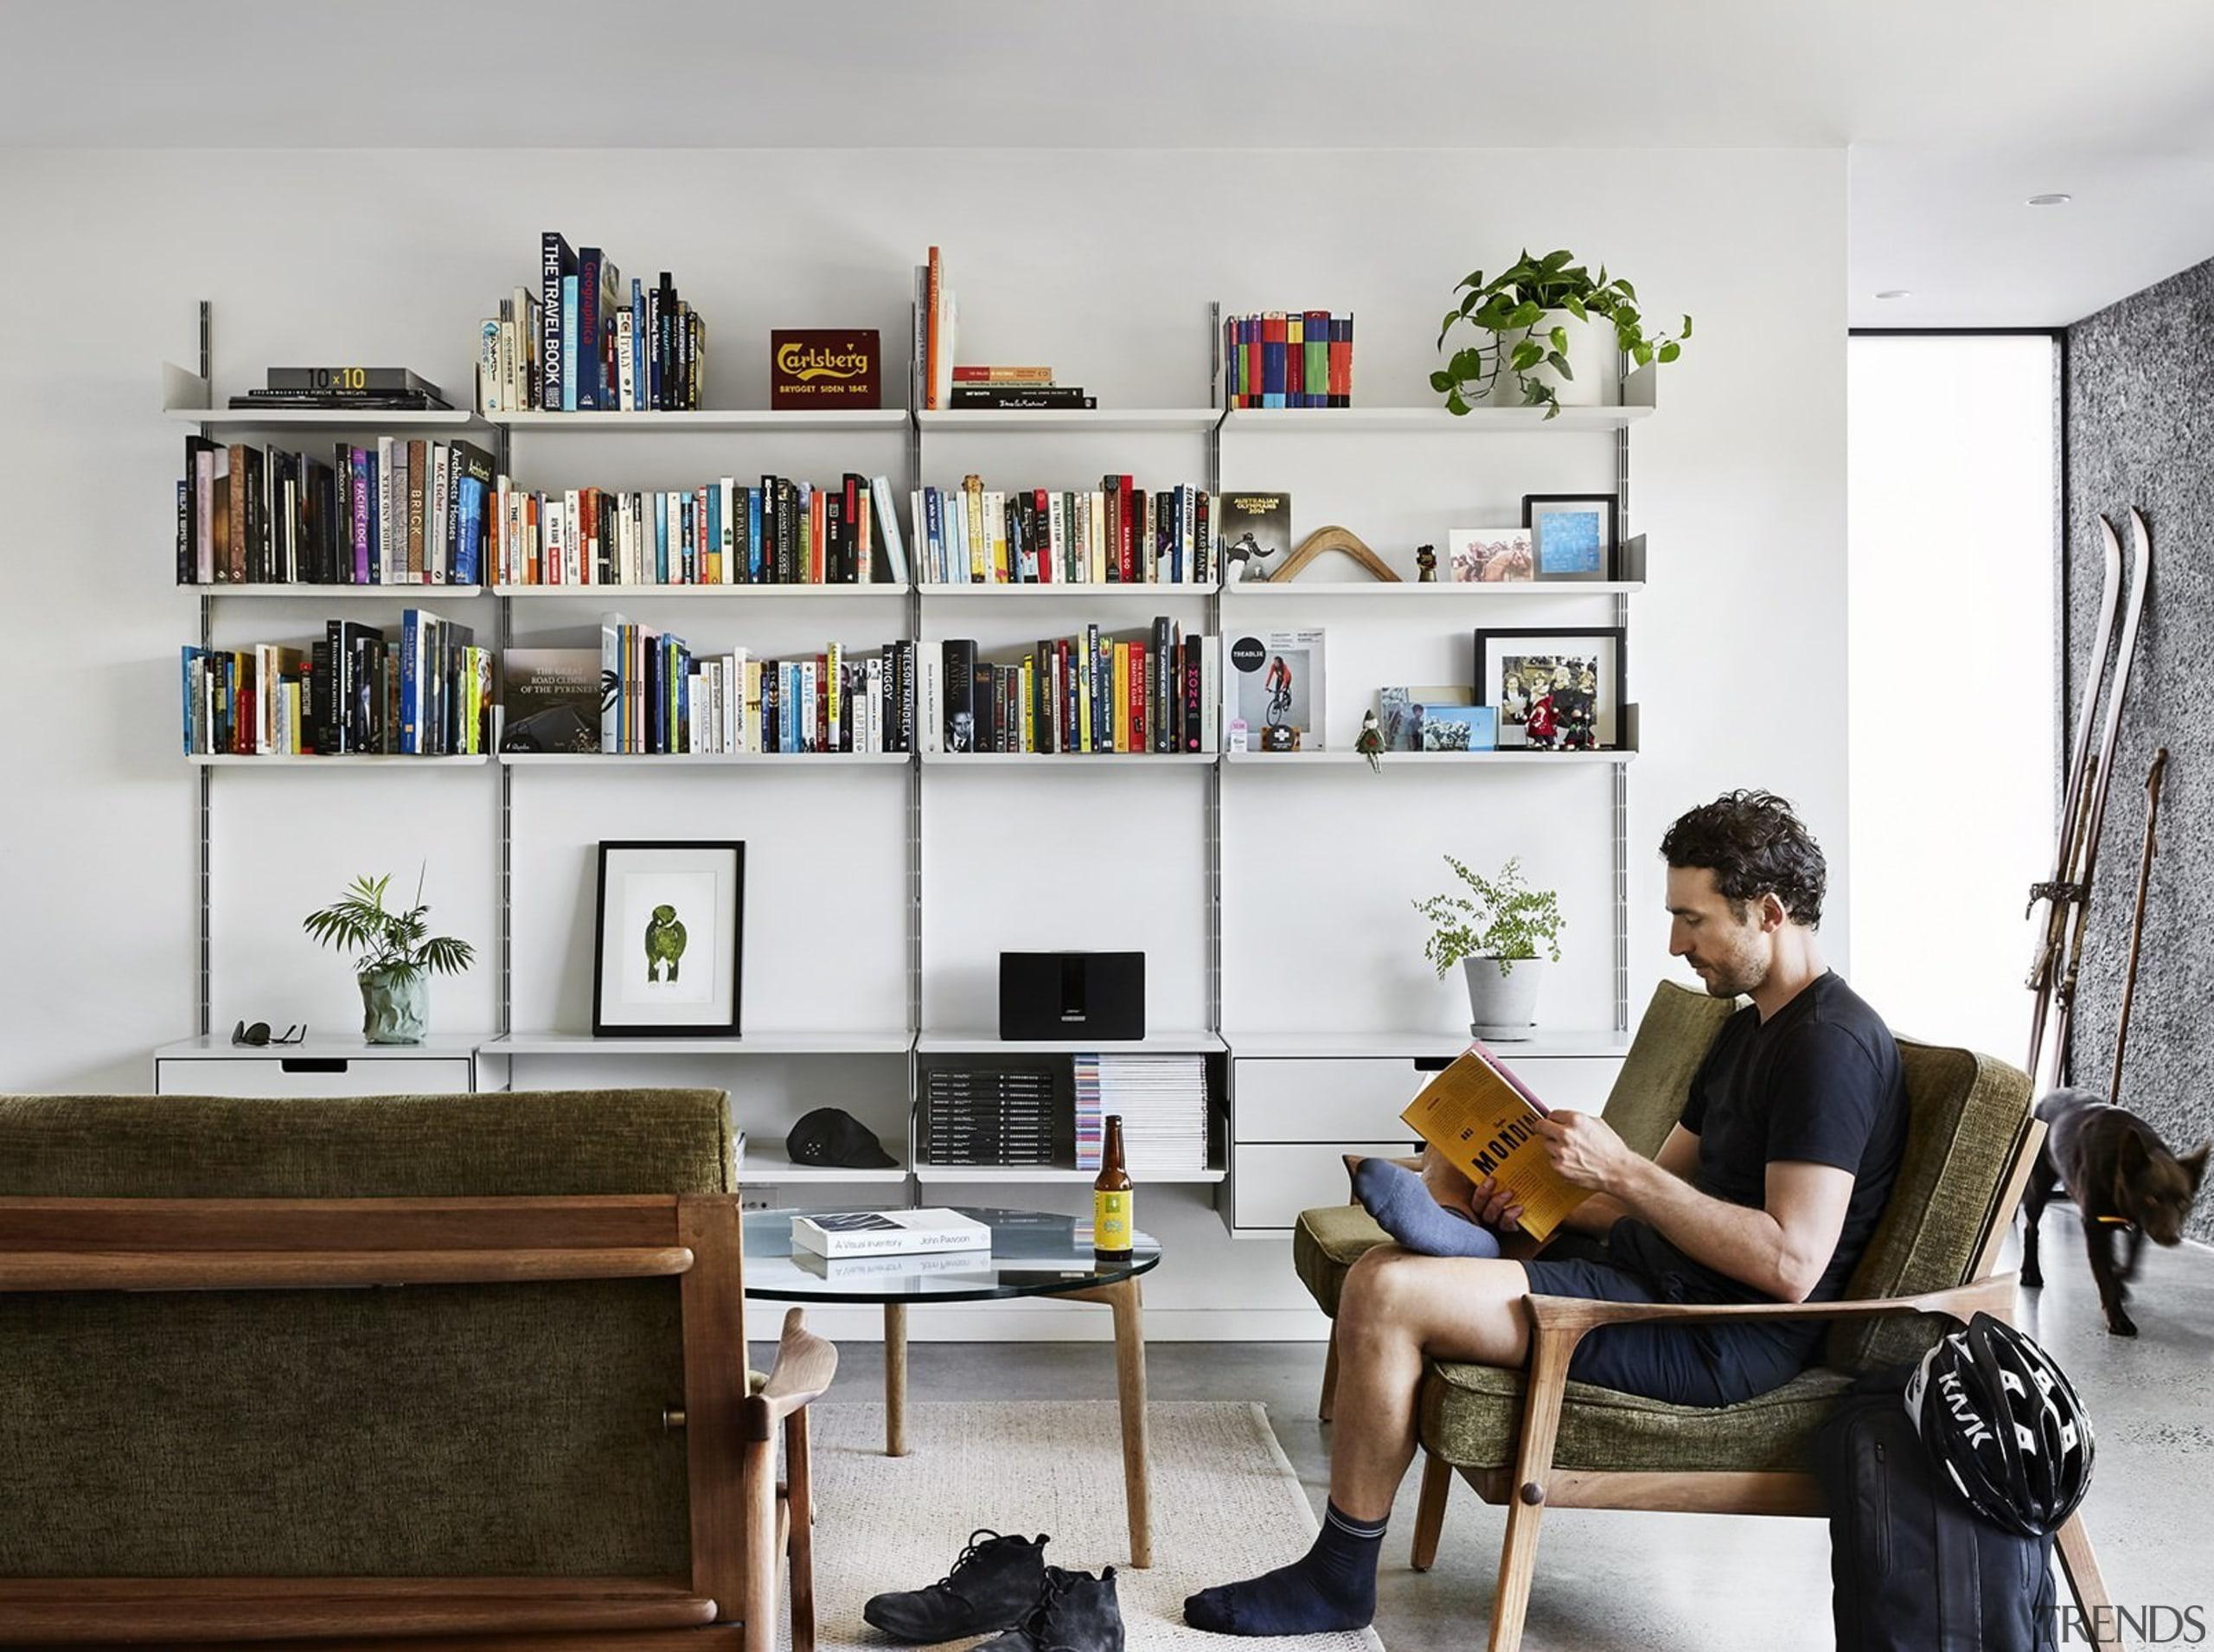 Architect: Liam WallisPhotography by Tess Kelly bookcase, furniture, interior design, living room, shelf, shelving, white